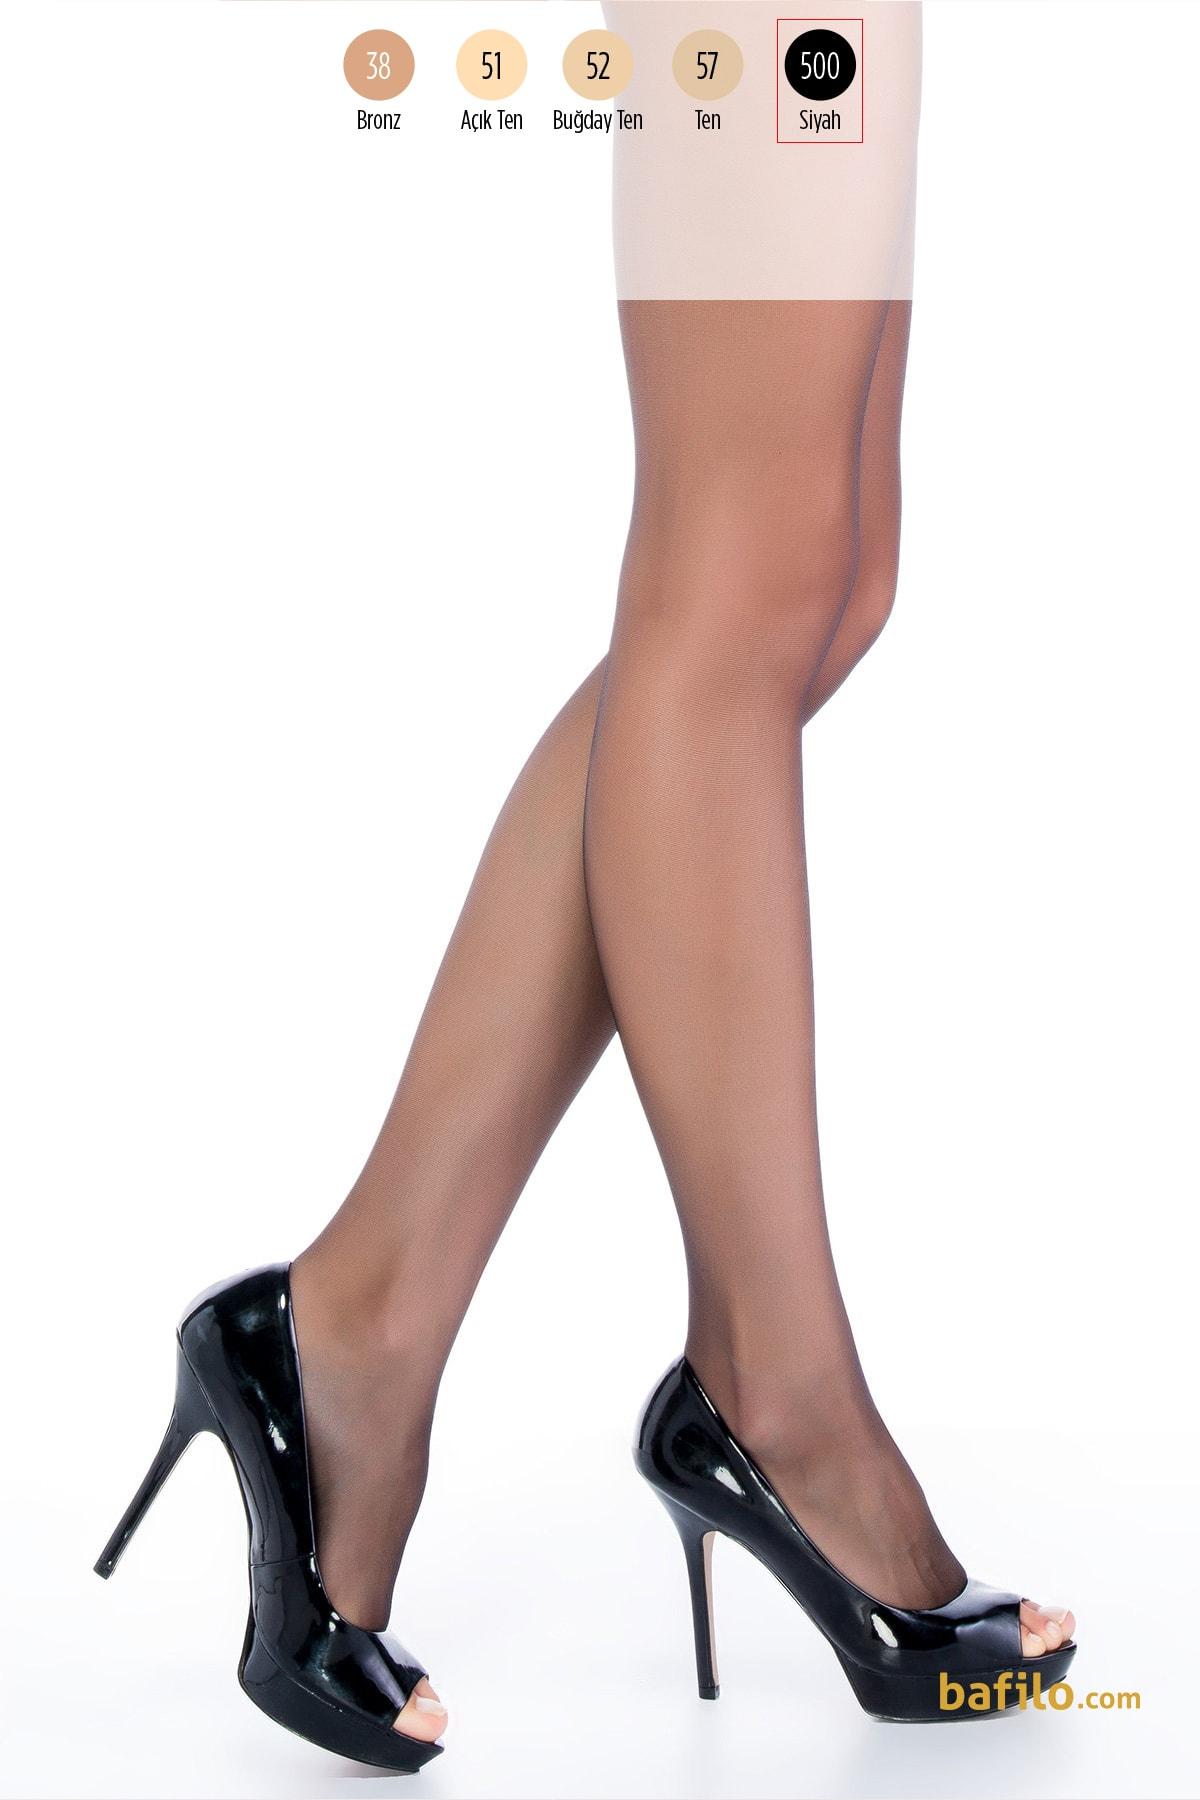 پنتی | Penti - جوراب شلواری دکلته پنتی Dekolte Parmaksiz 10 - مشکی